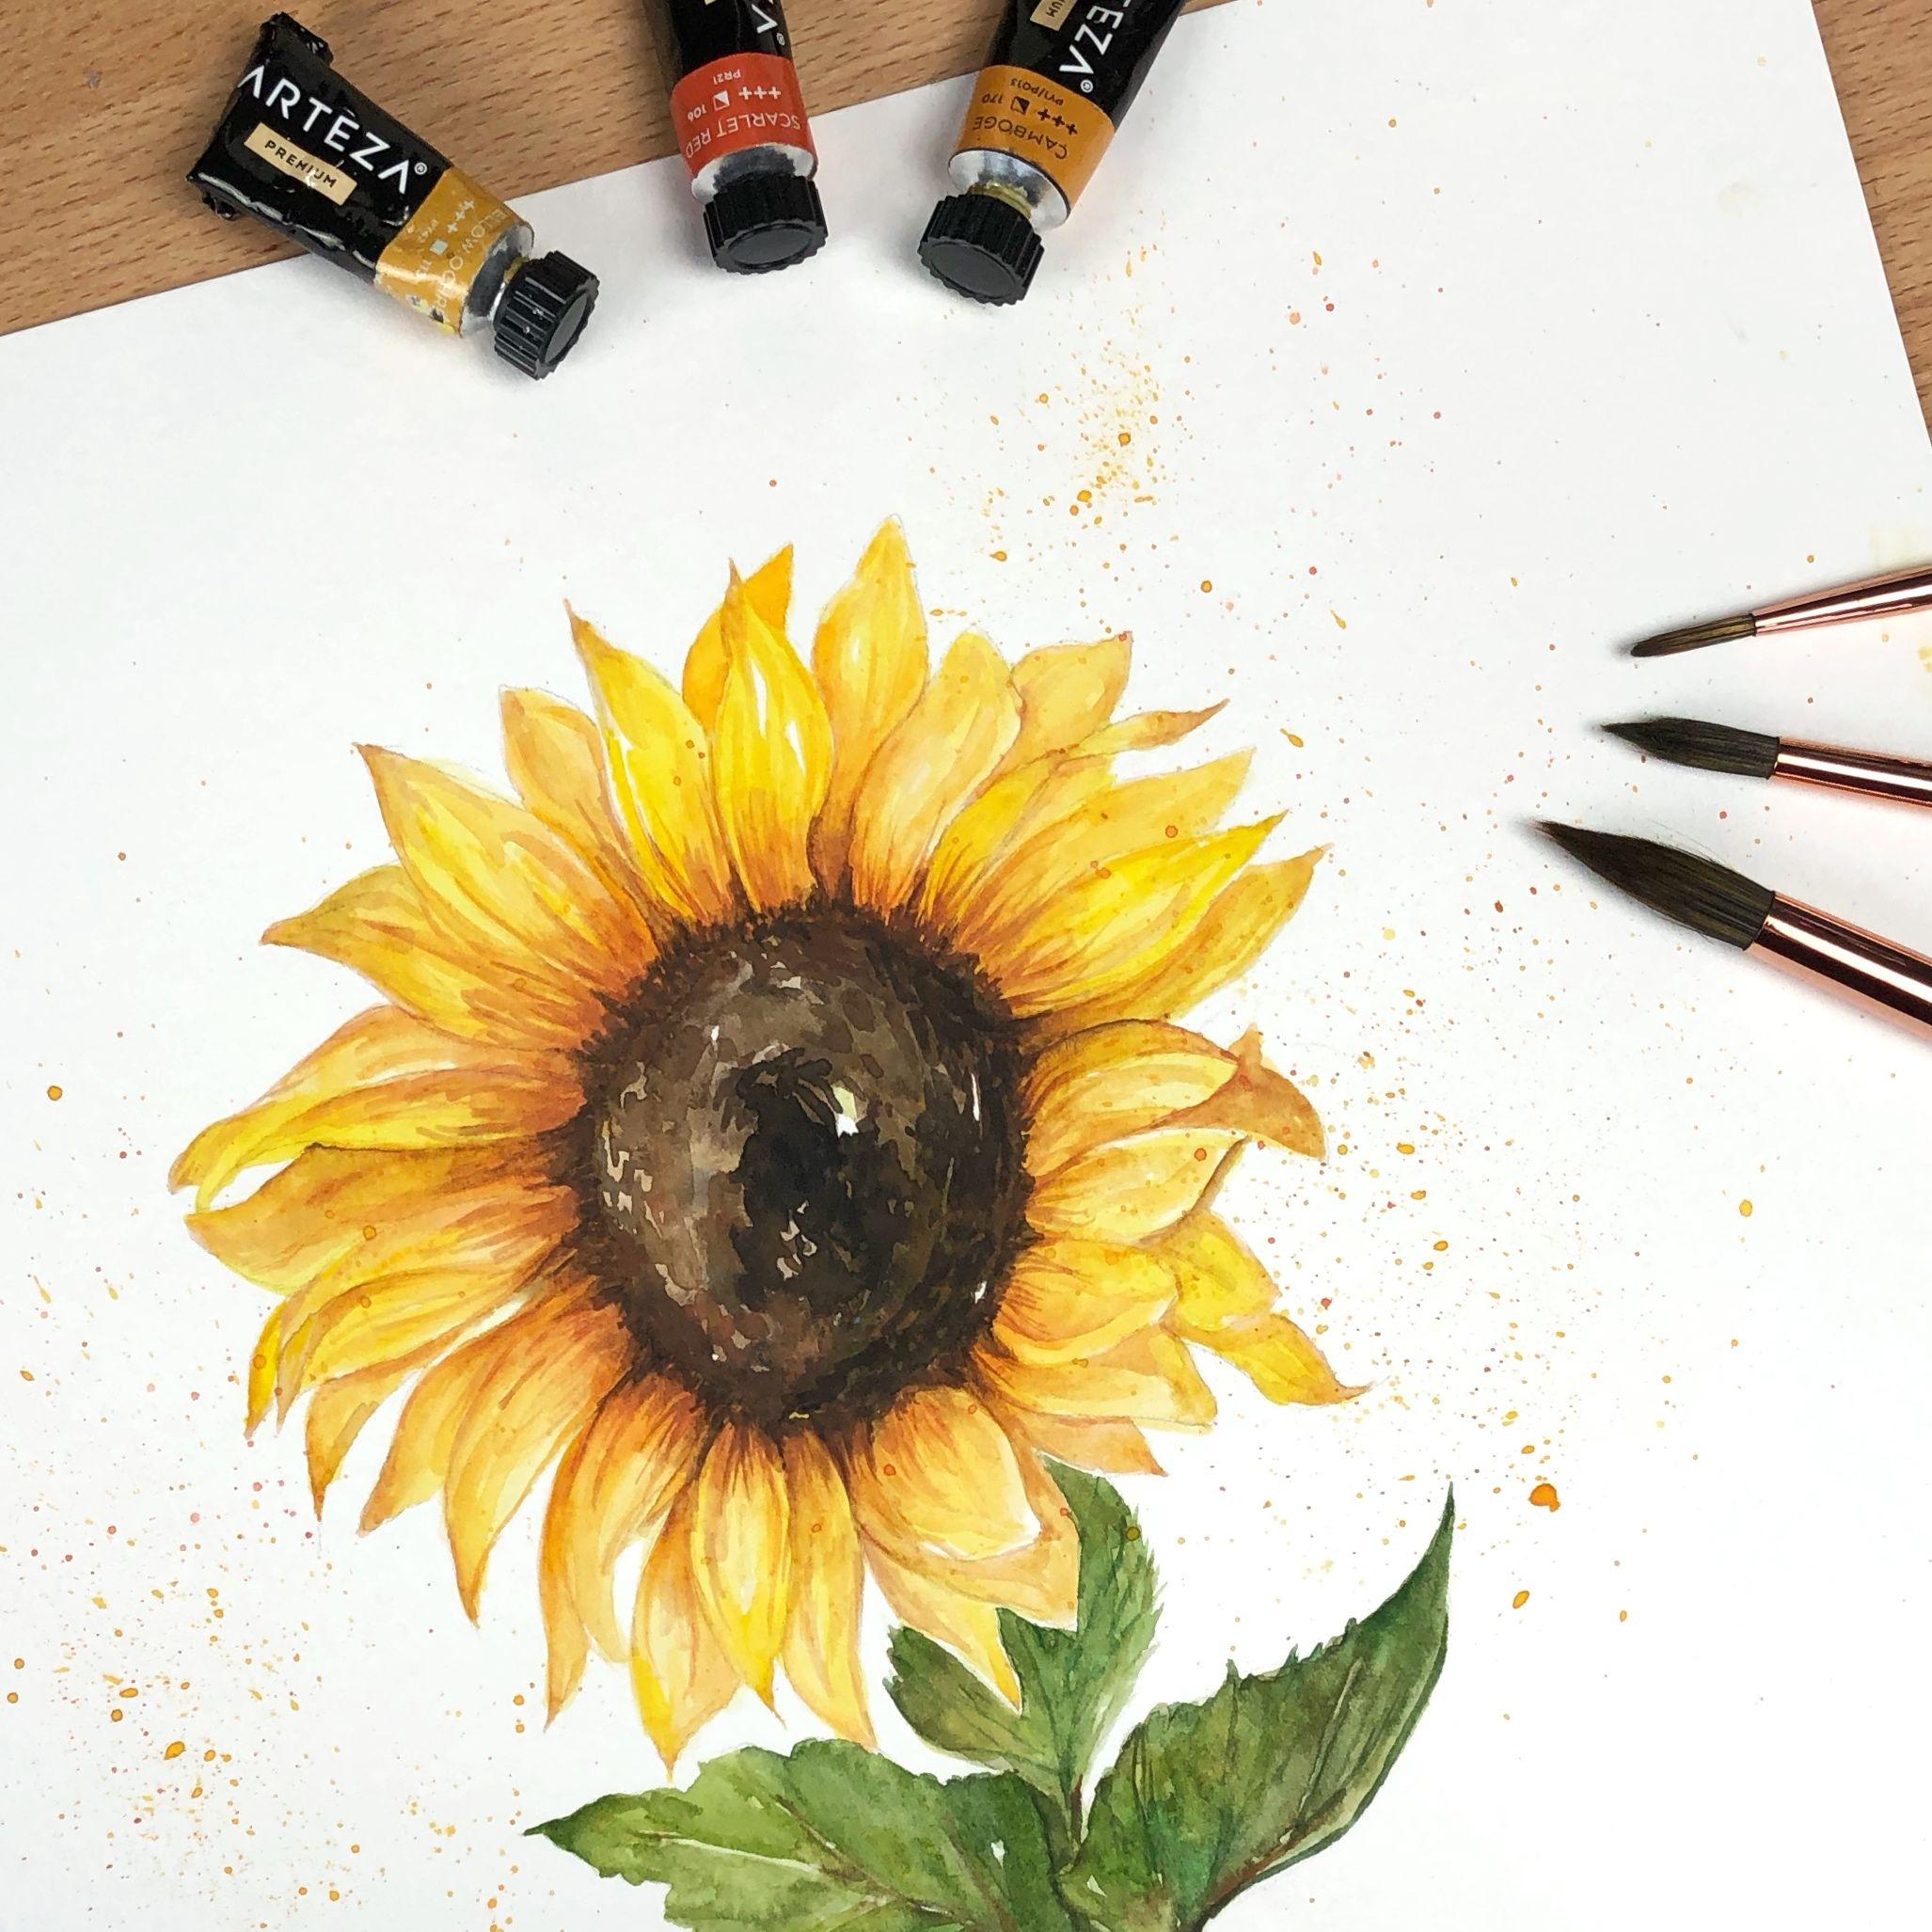 Watercolor Sunflower Painting Art Artist Artwork Watercolor